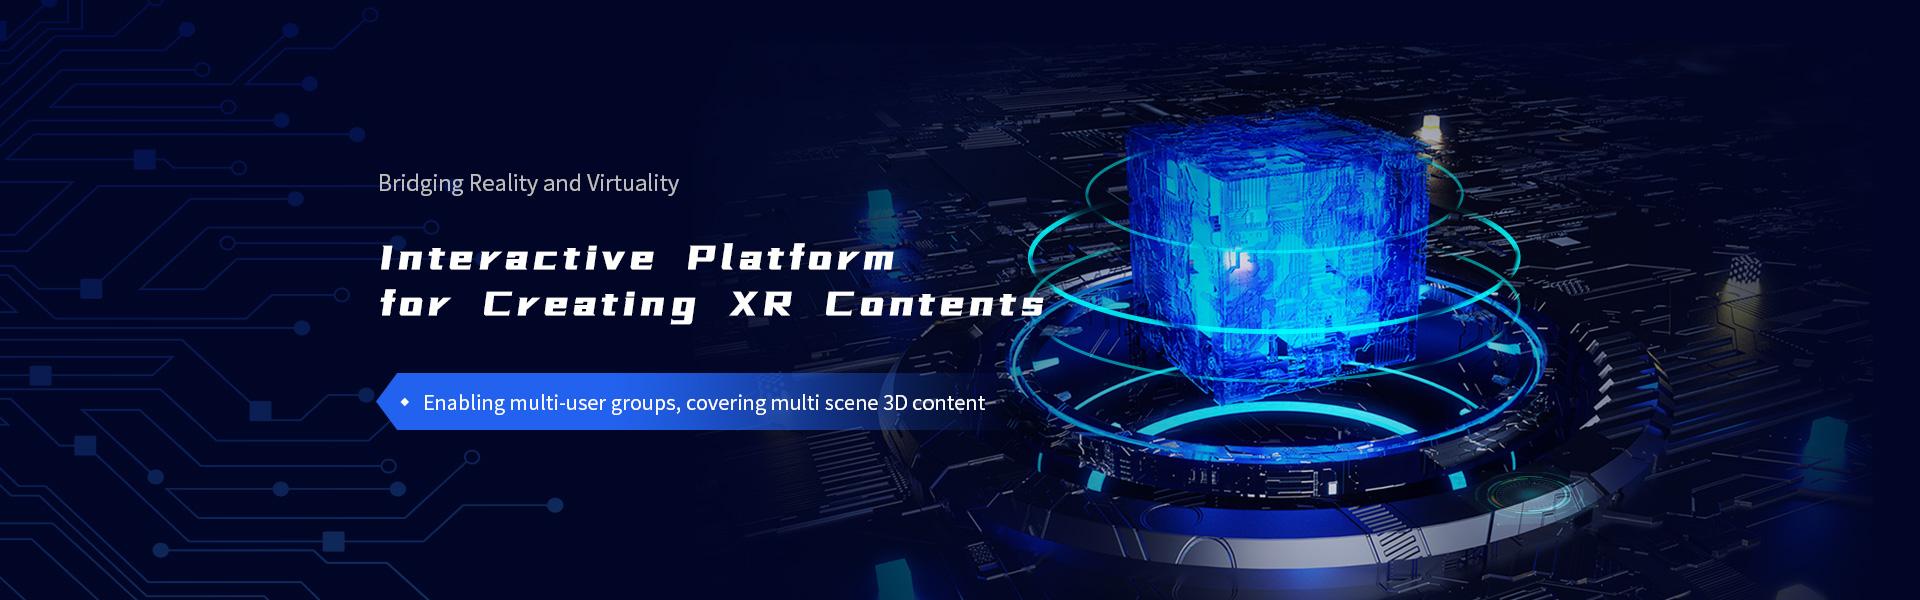 XR内容的创作和互动平台